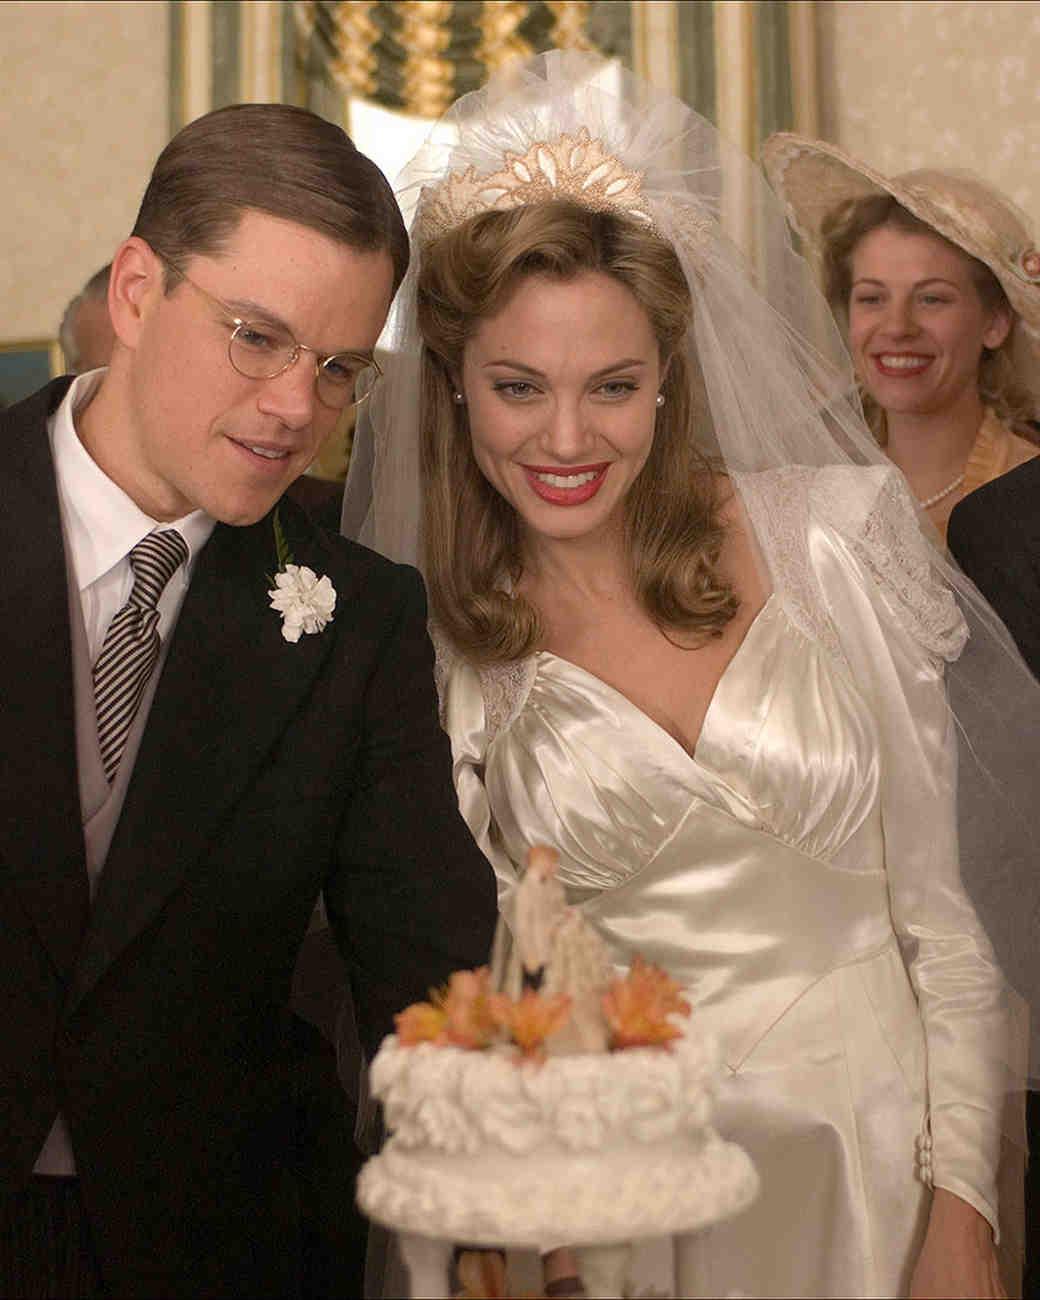 movie-wedding-dresses-the-good-shepherd-angelina-jolie-0316.jpg